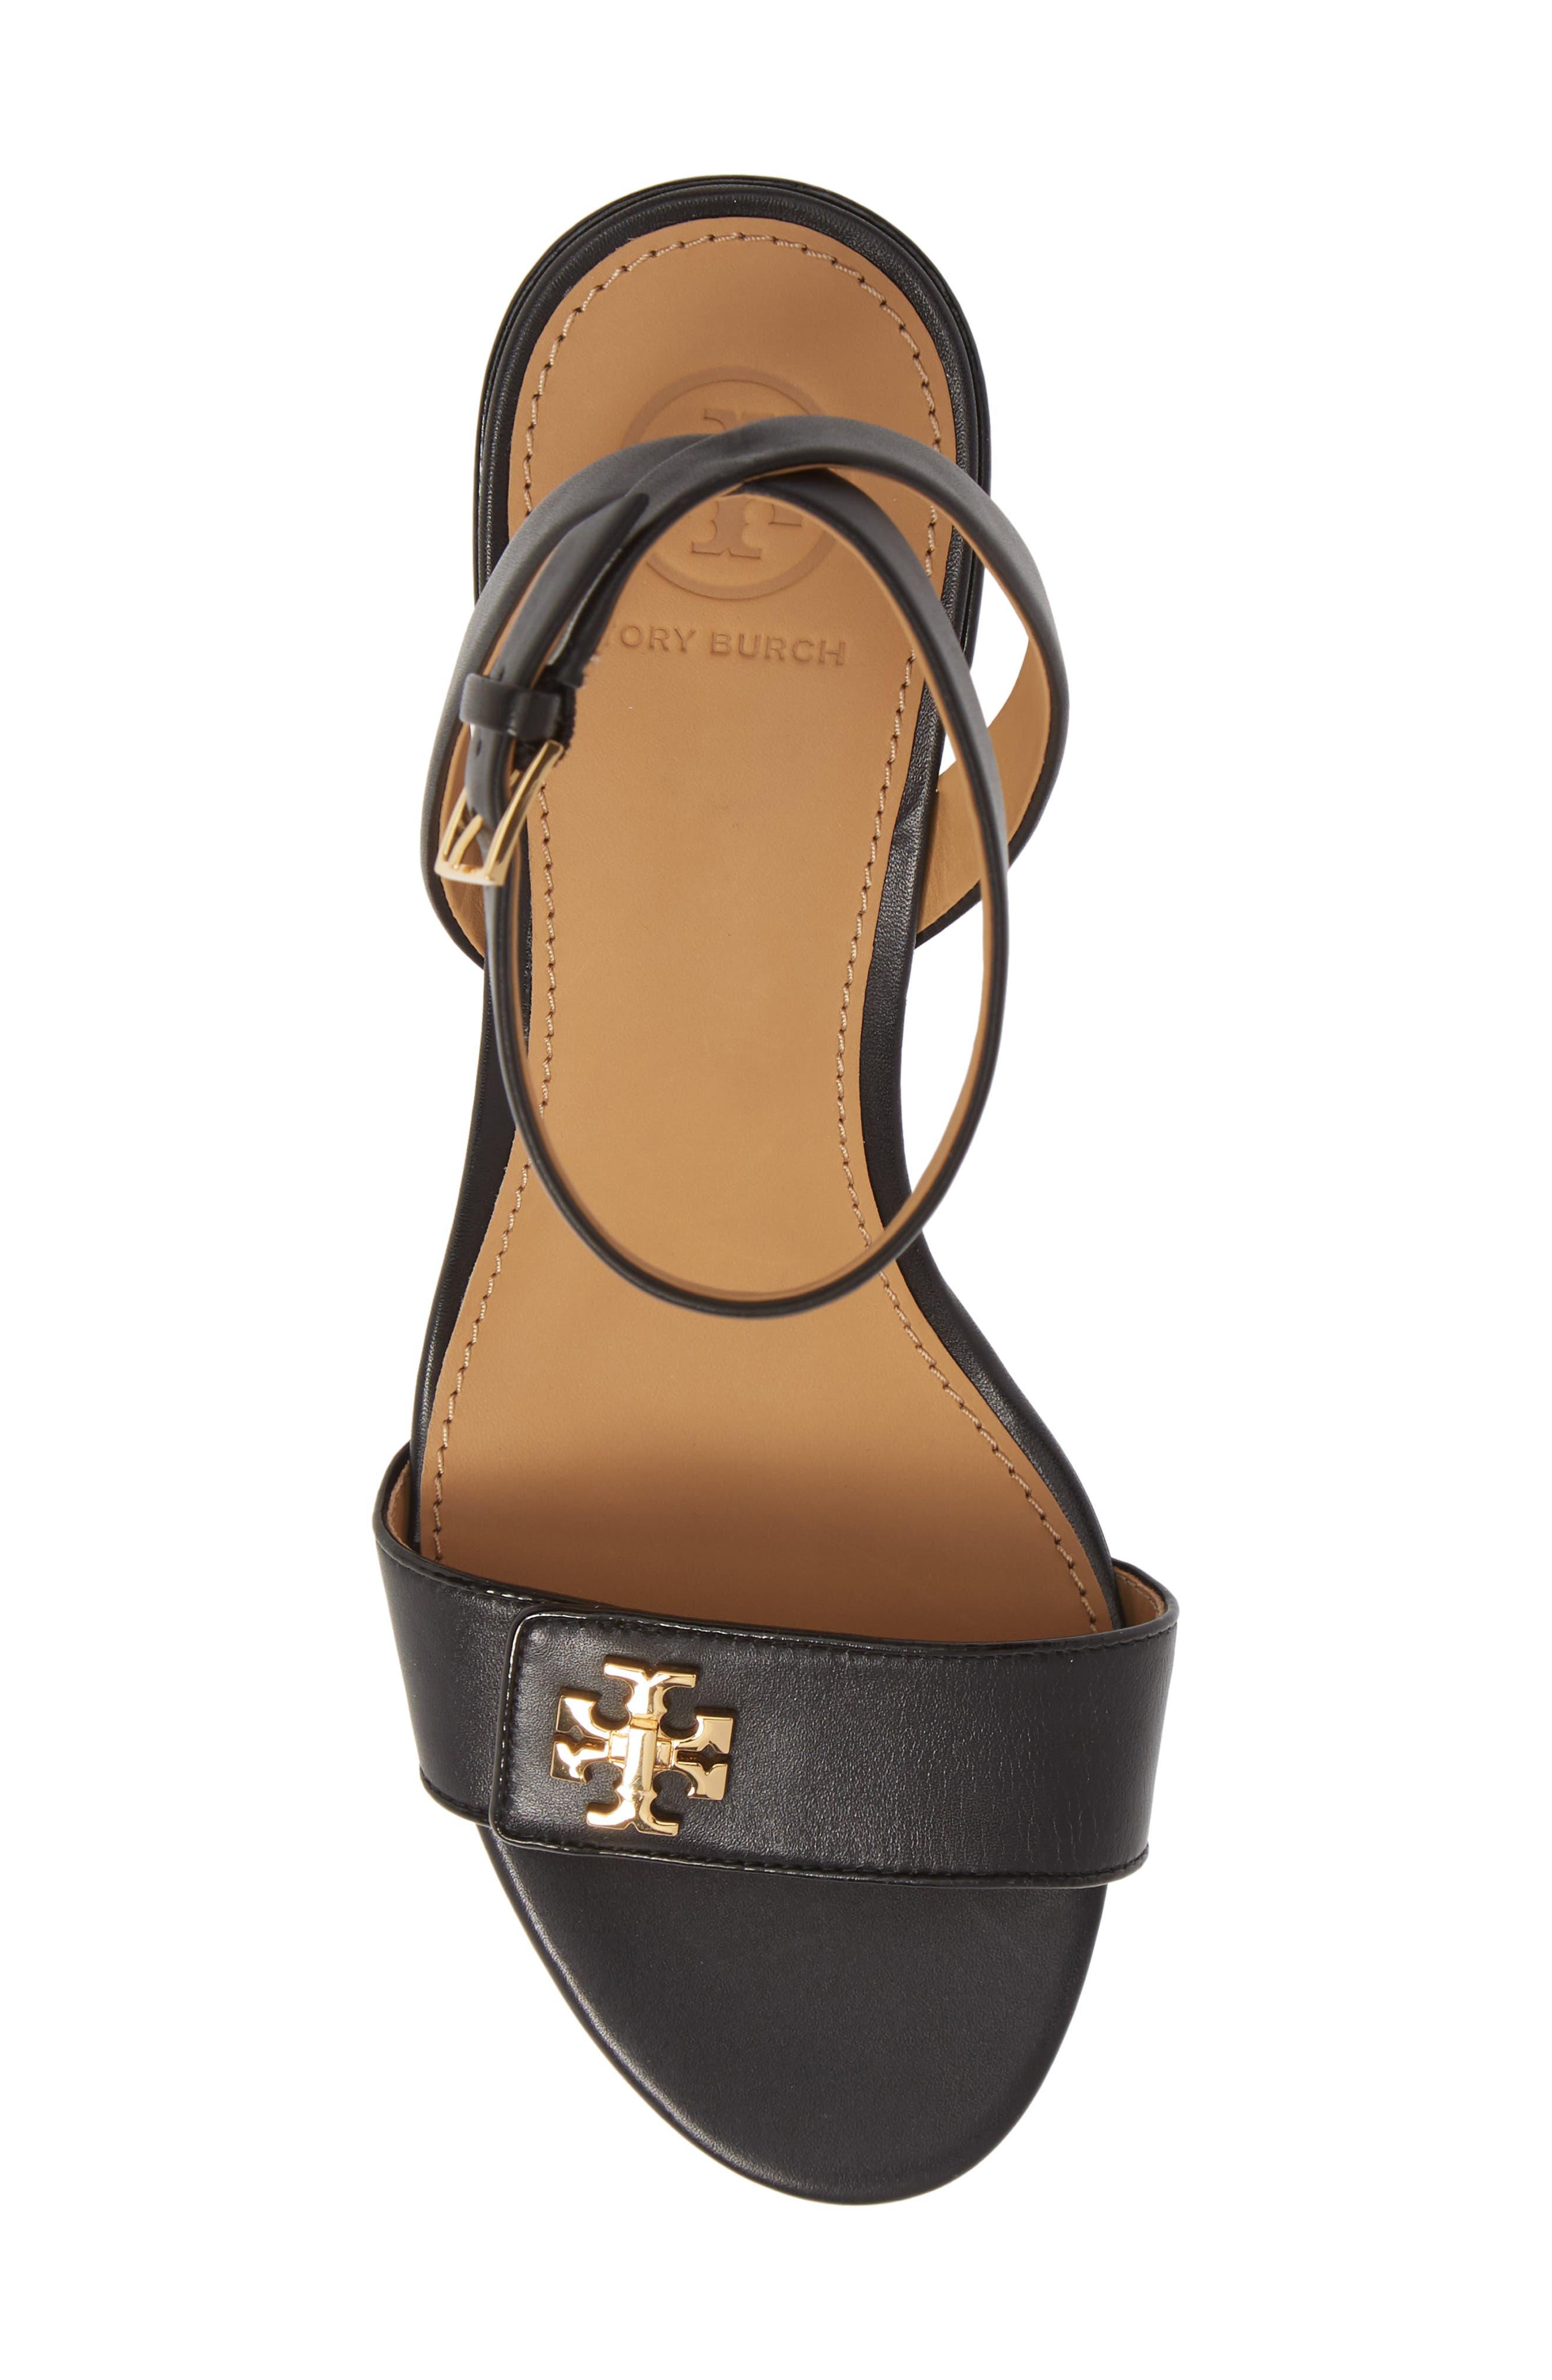 Kira Block Heel Sandal,                             Alternate thumbnail 5, color,                             PERFECT BLACK/ PERFECT BLACK